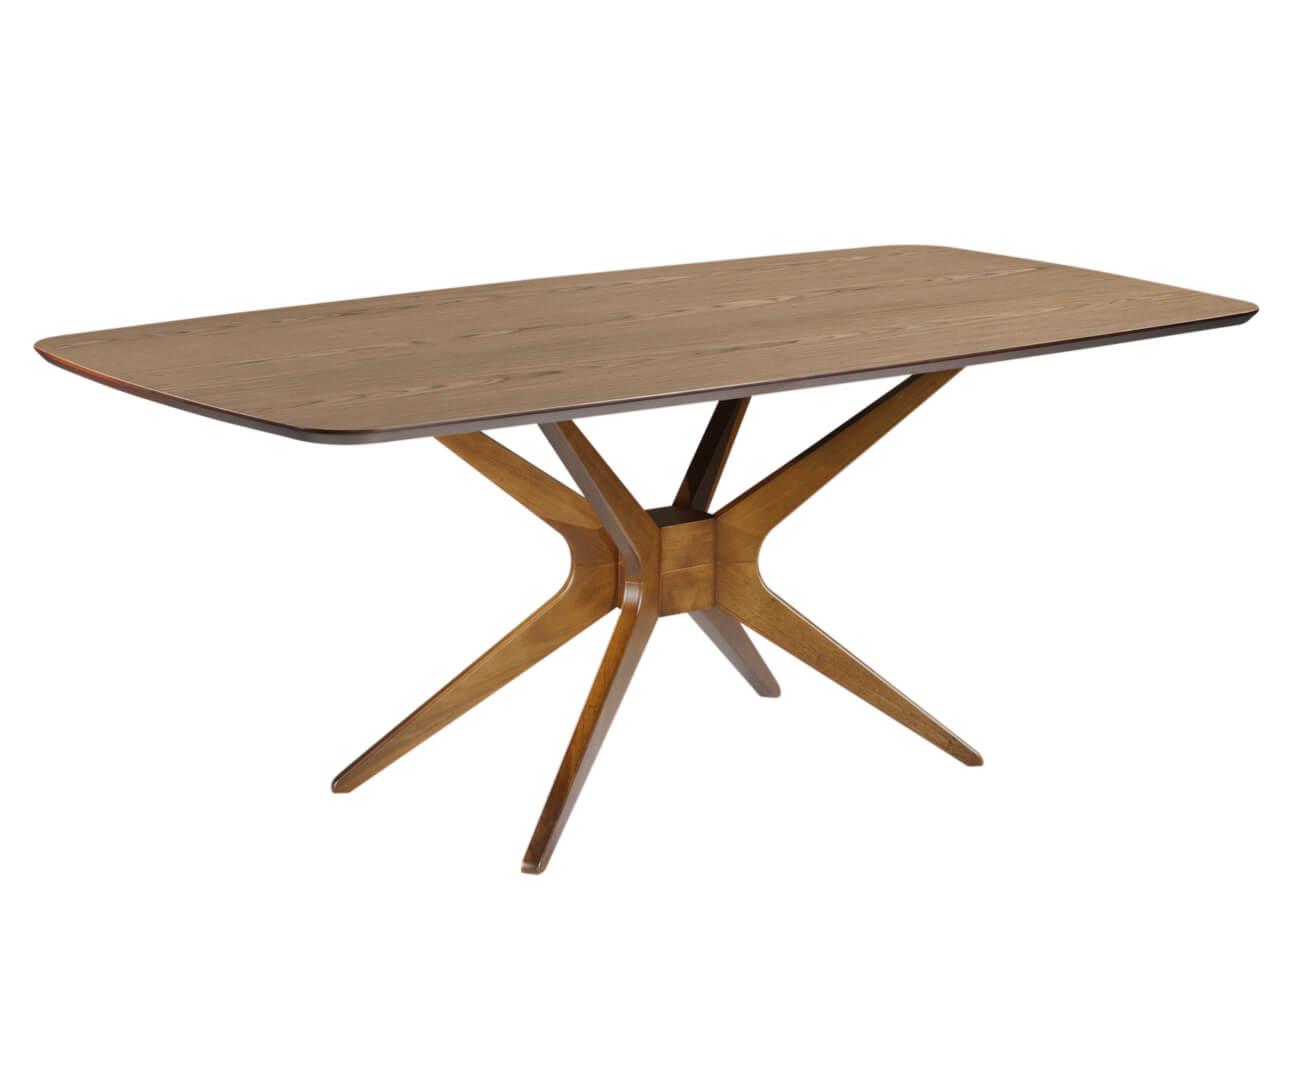 mesa de jantar em madeira xs 0304